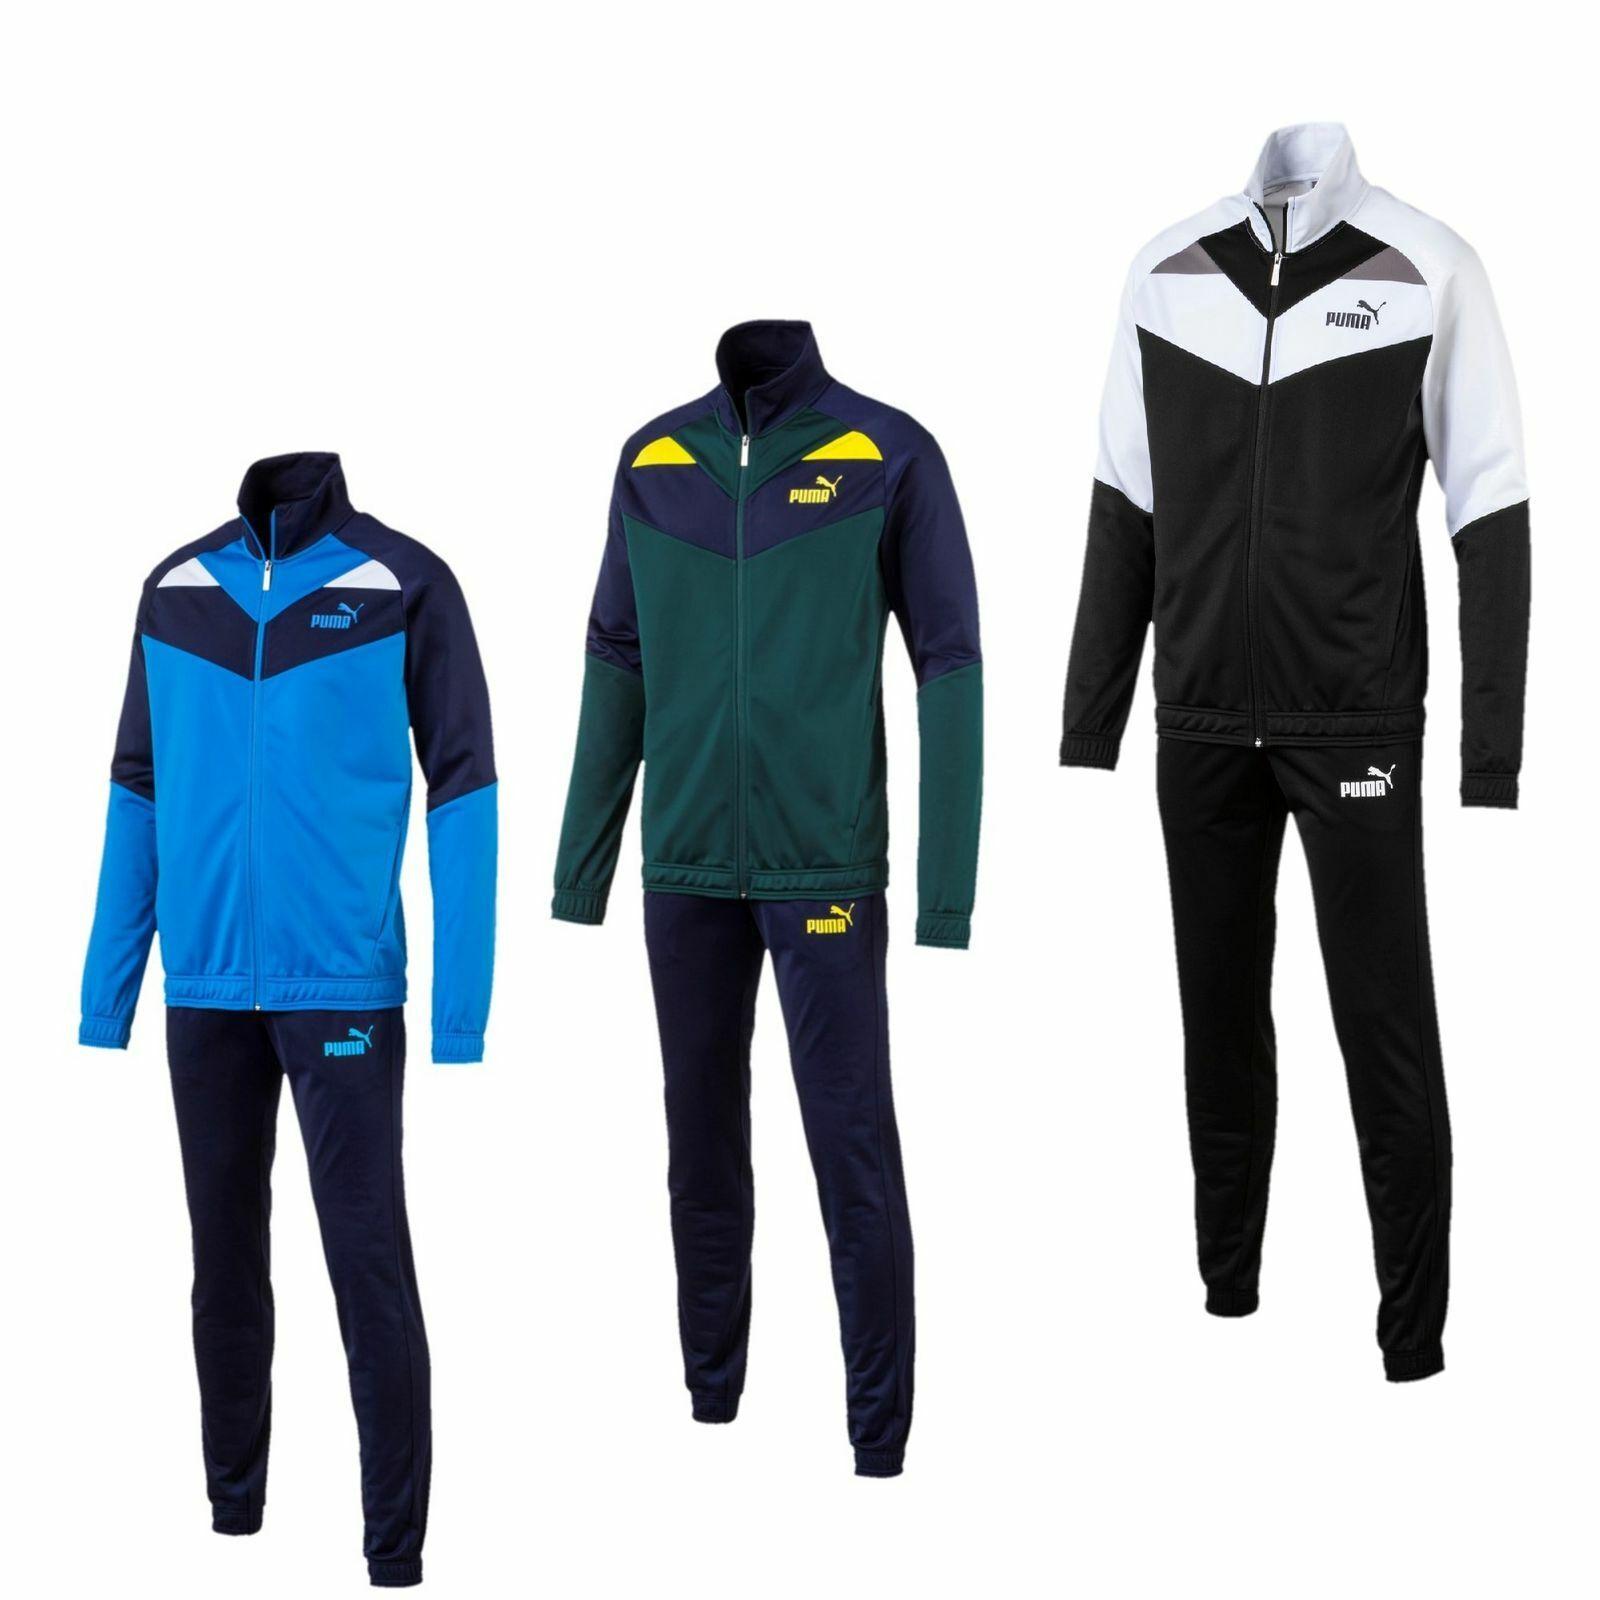 1dccdf4ca8ee9 ... Puma Jogginganzug Herren Jogging Anzug Sportanzug Trainingsanzug Männer  blau